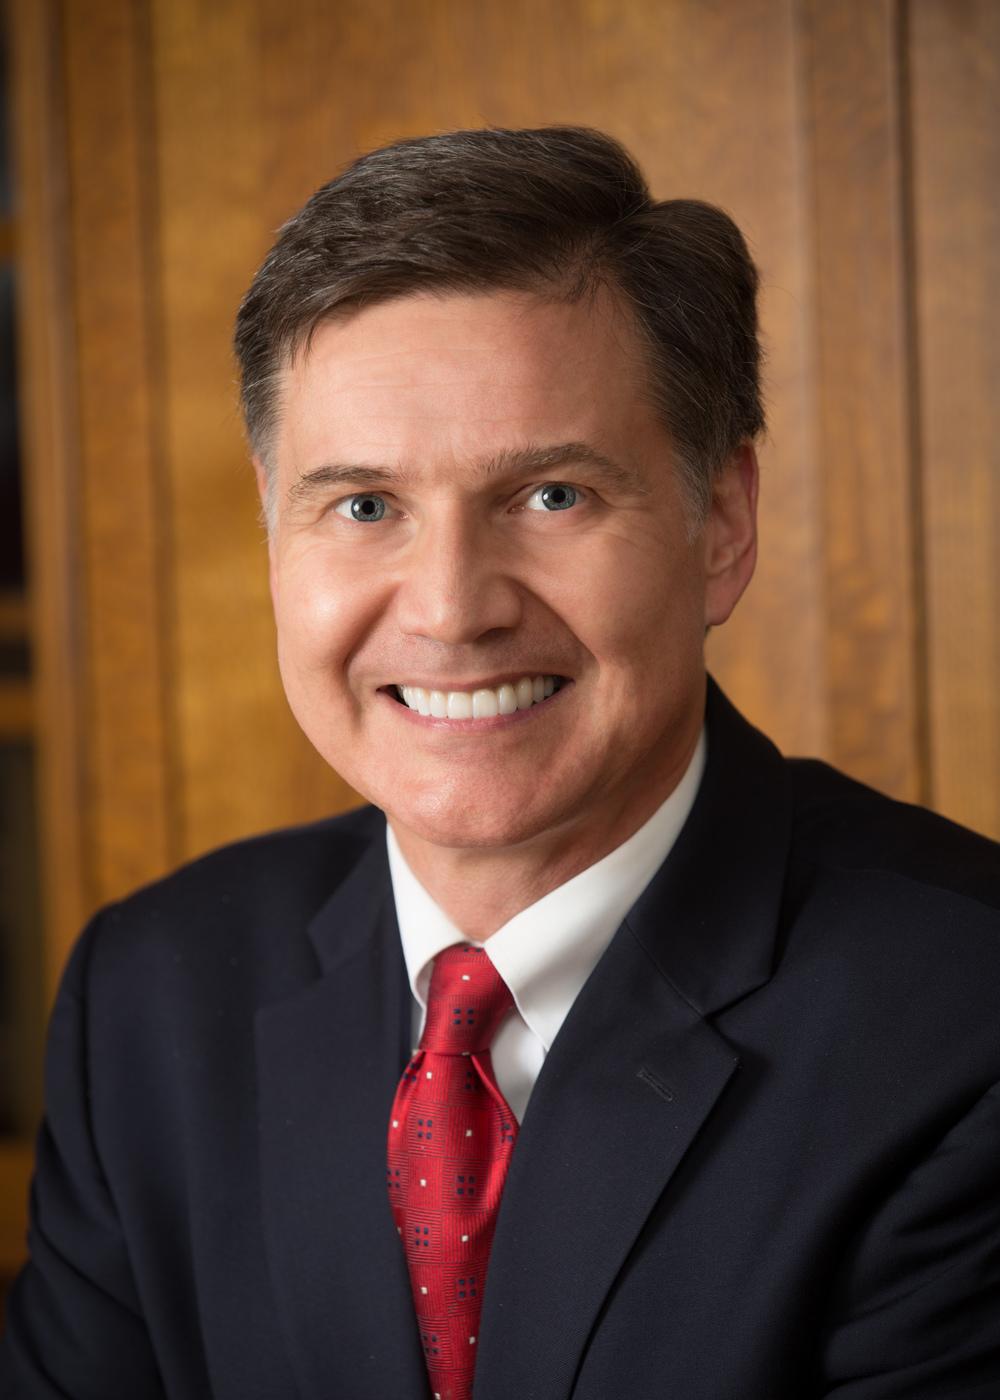 Daniel Esty, Profesor, Yale University